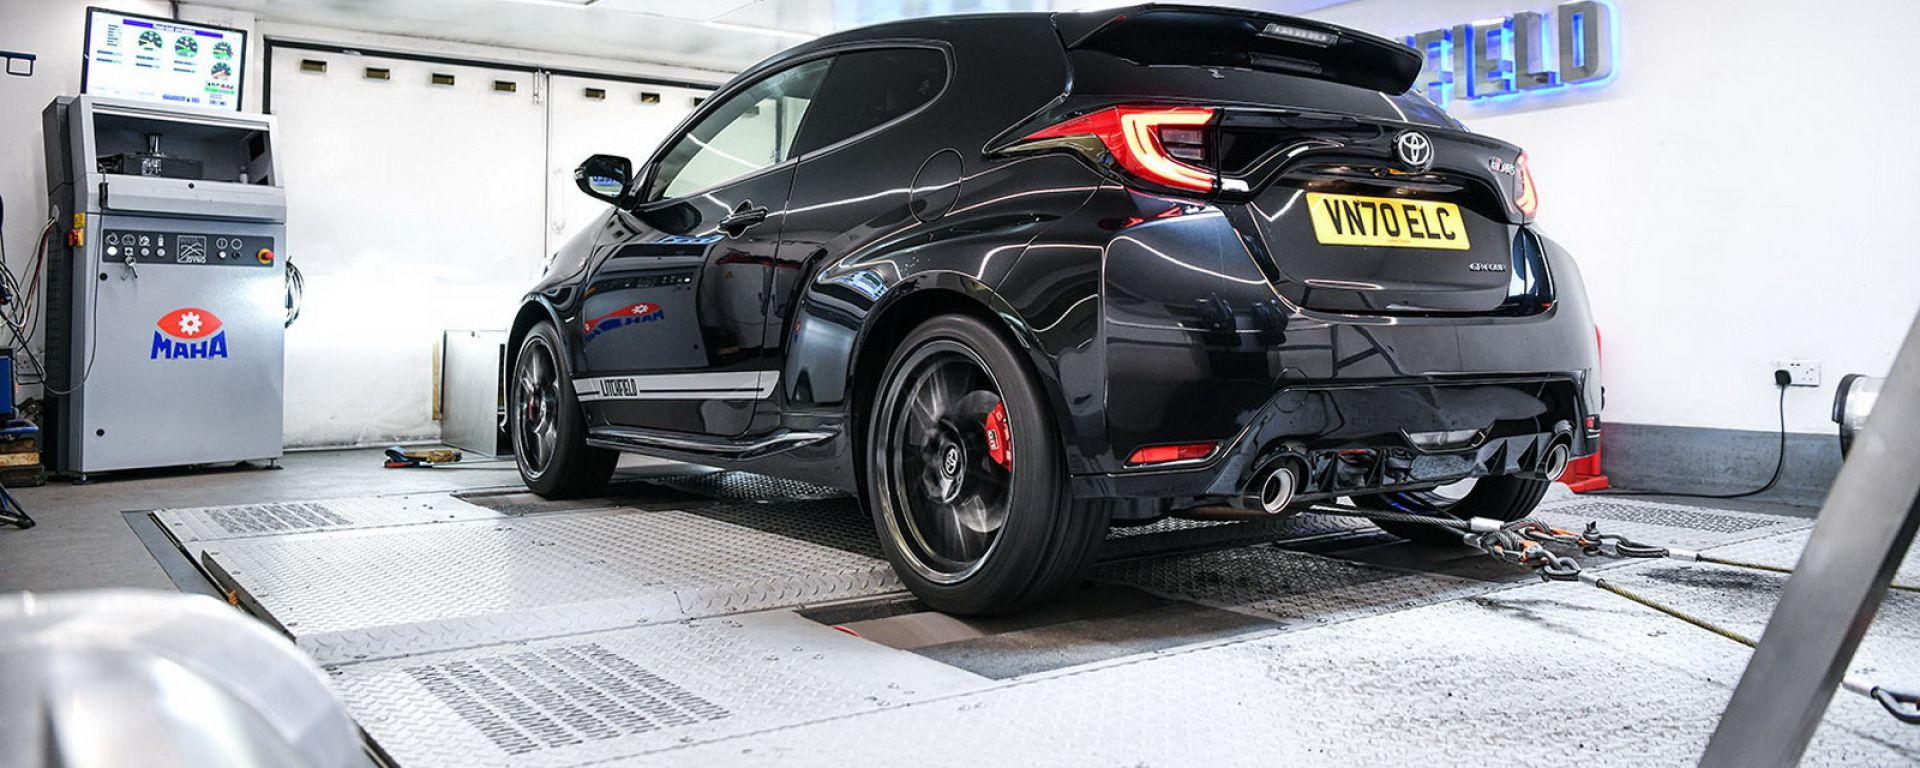 Toyota GR Yaris by Litchfield: 300 CV sul banco a rulli accelerativo